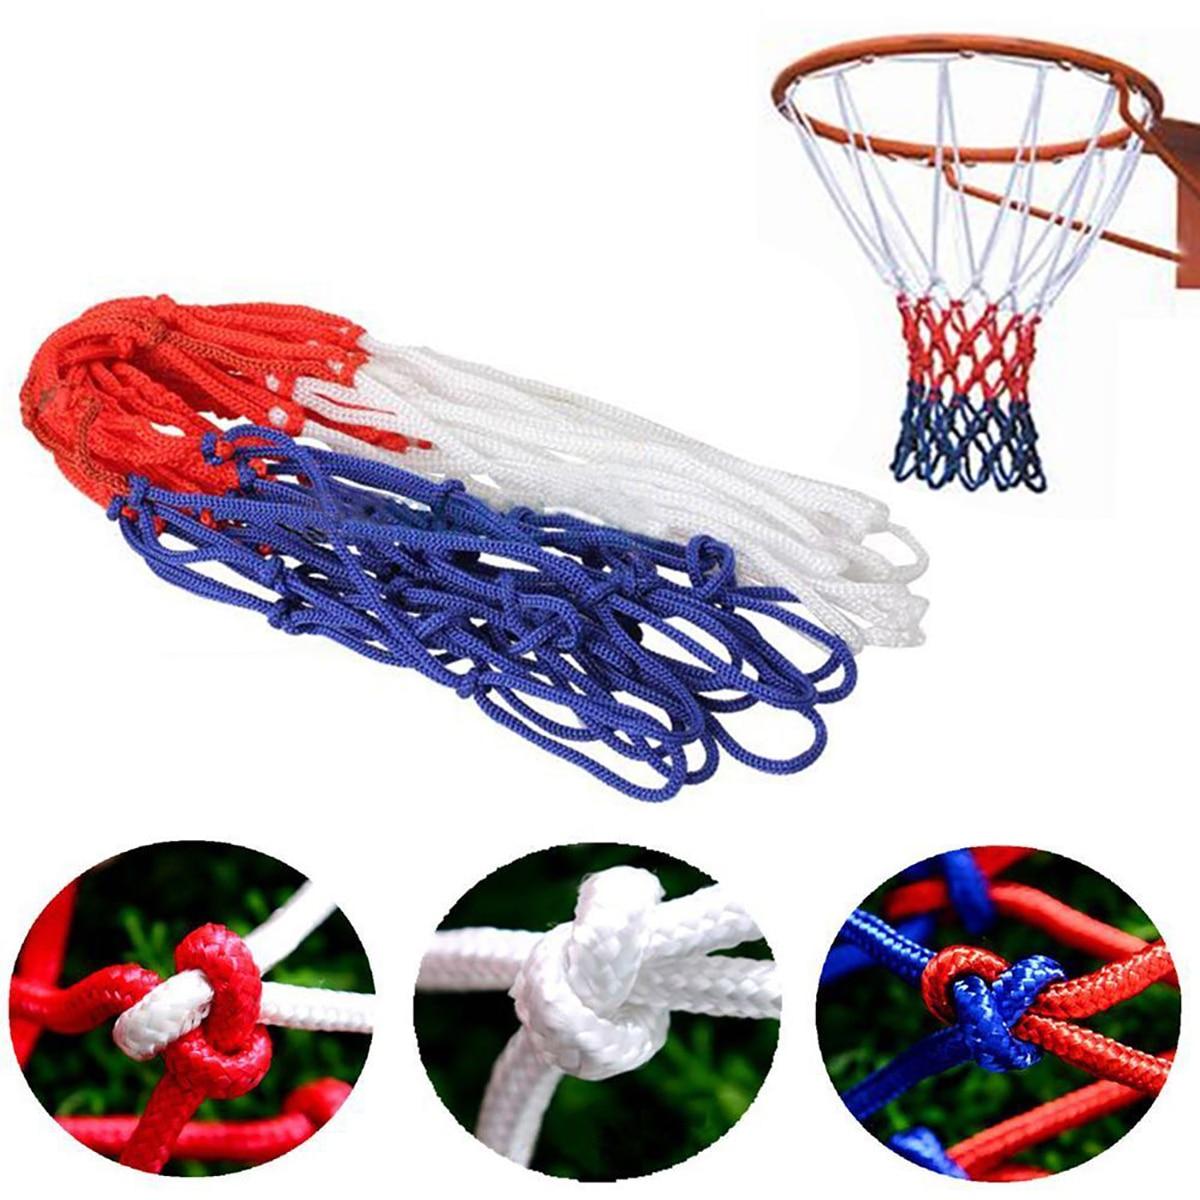 Mayitr Basketball Training Standard Basketball Mesh Nylon Thread Goal Hoop Net Outdoor Hanging Rim Backboard